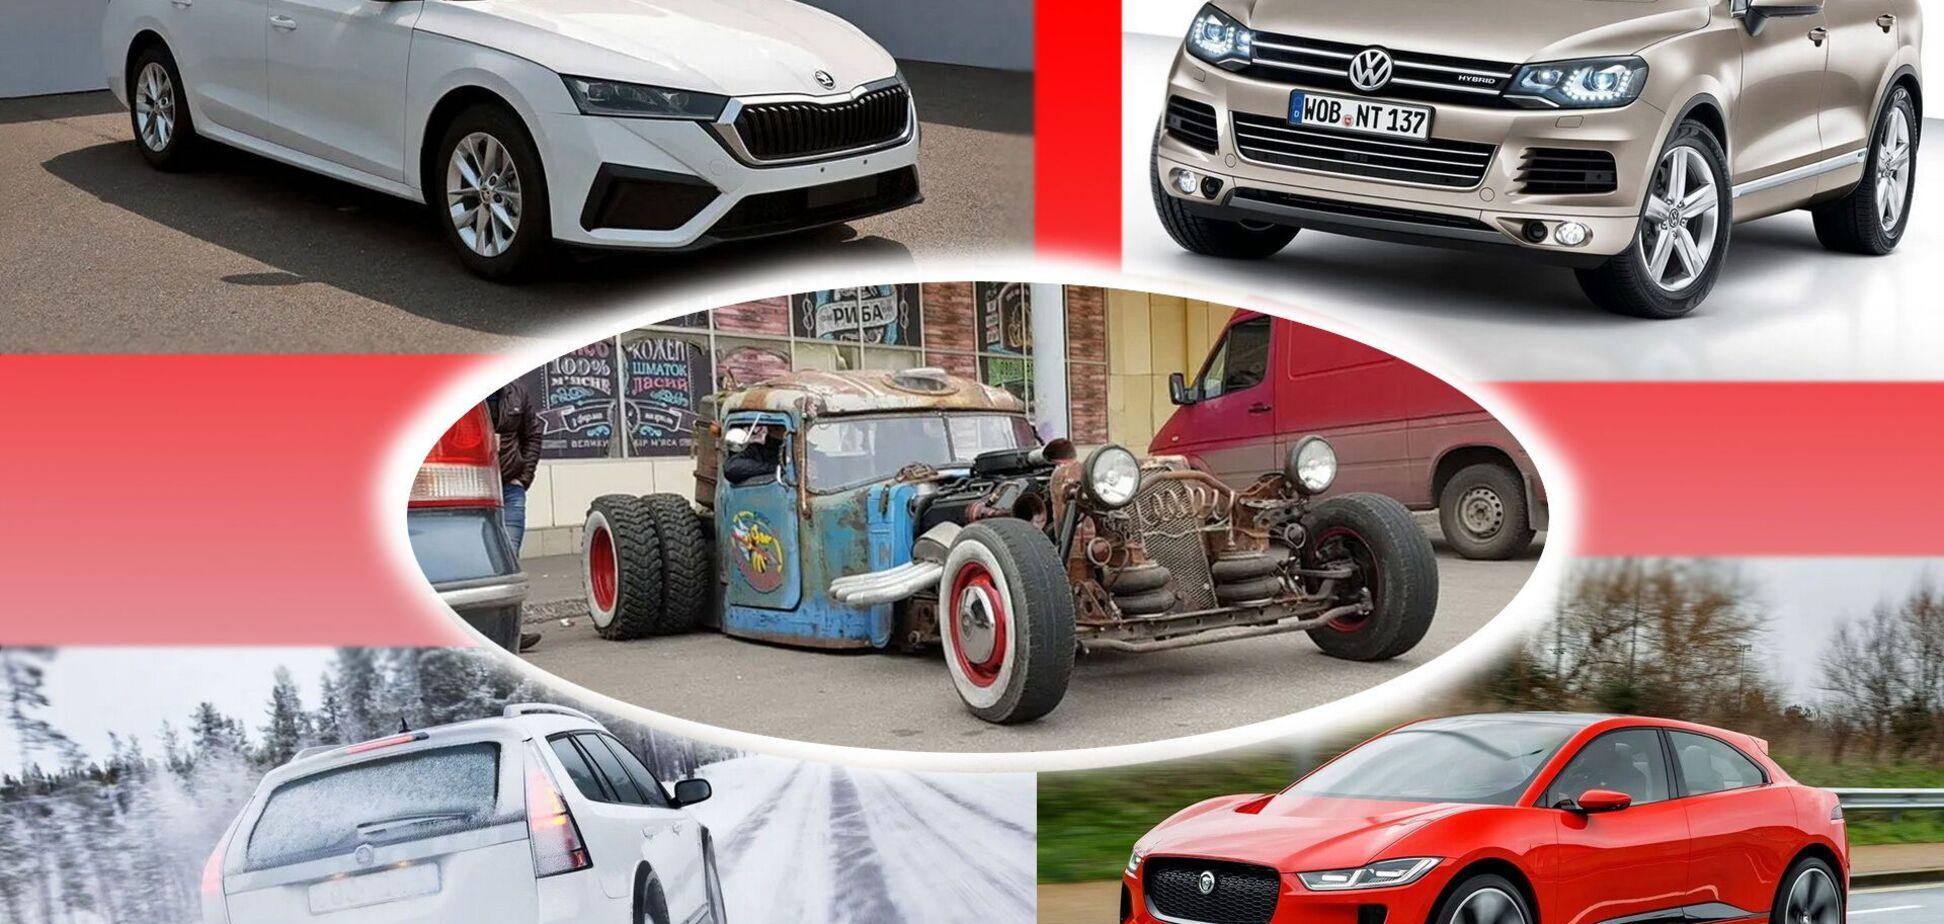 Мастило за $21 000, найнадійніші SUV та Octavia Pro: дайджест тижня